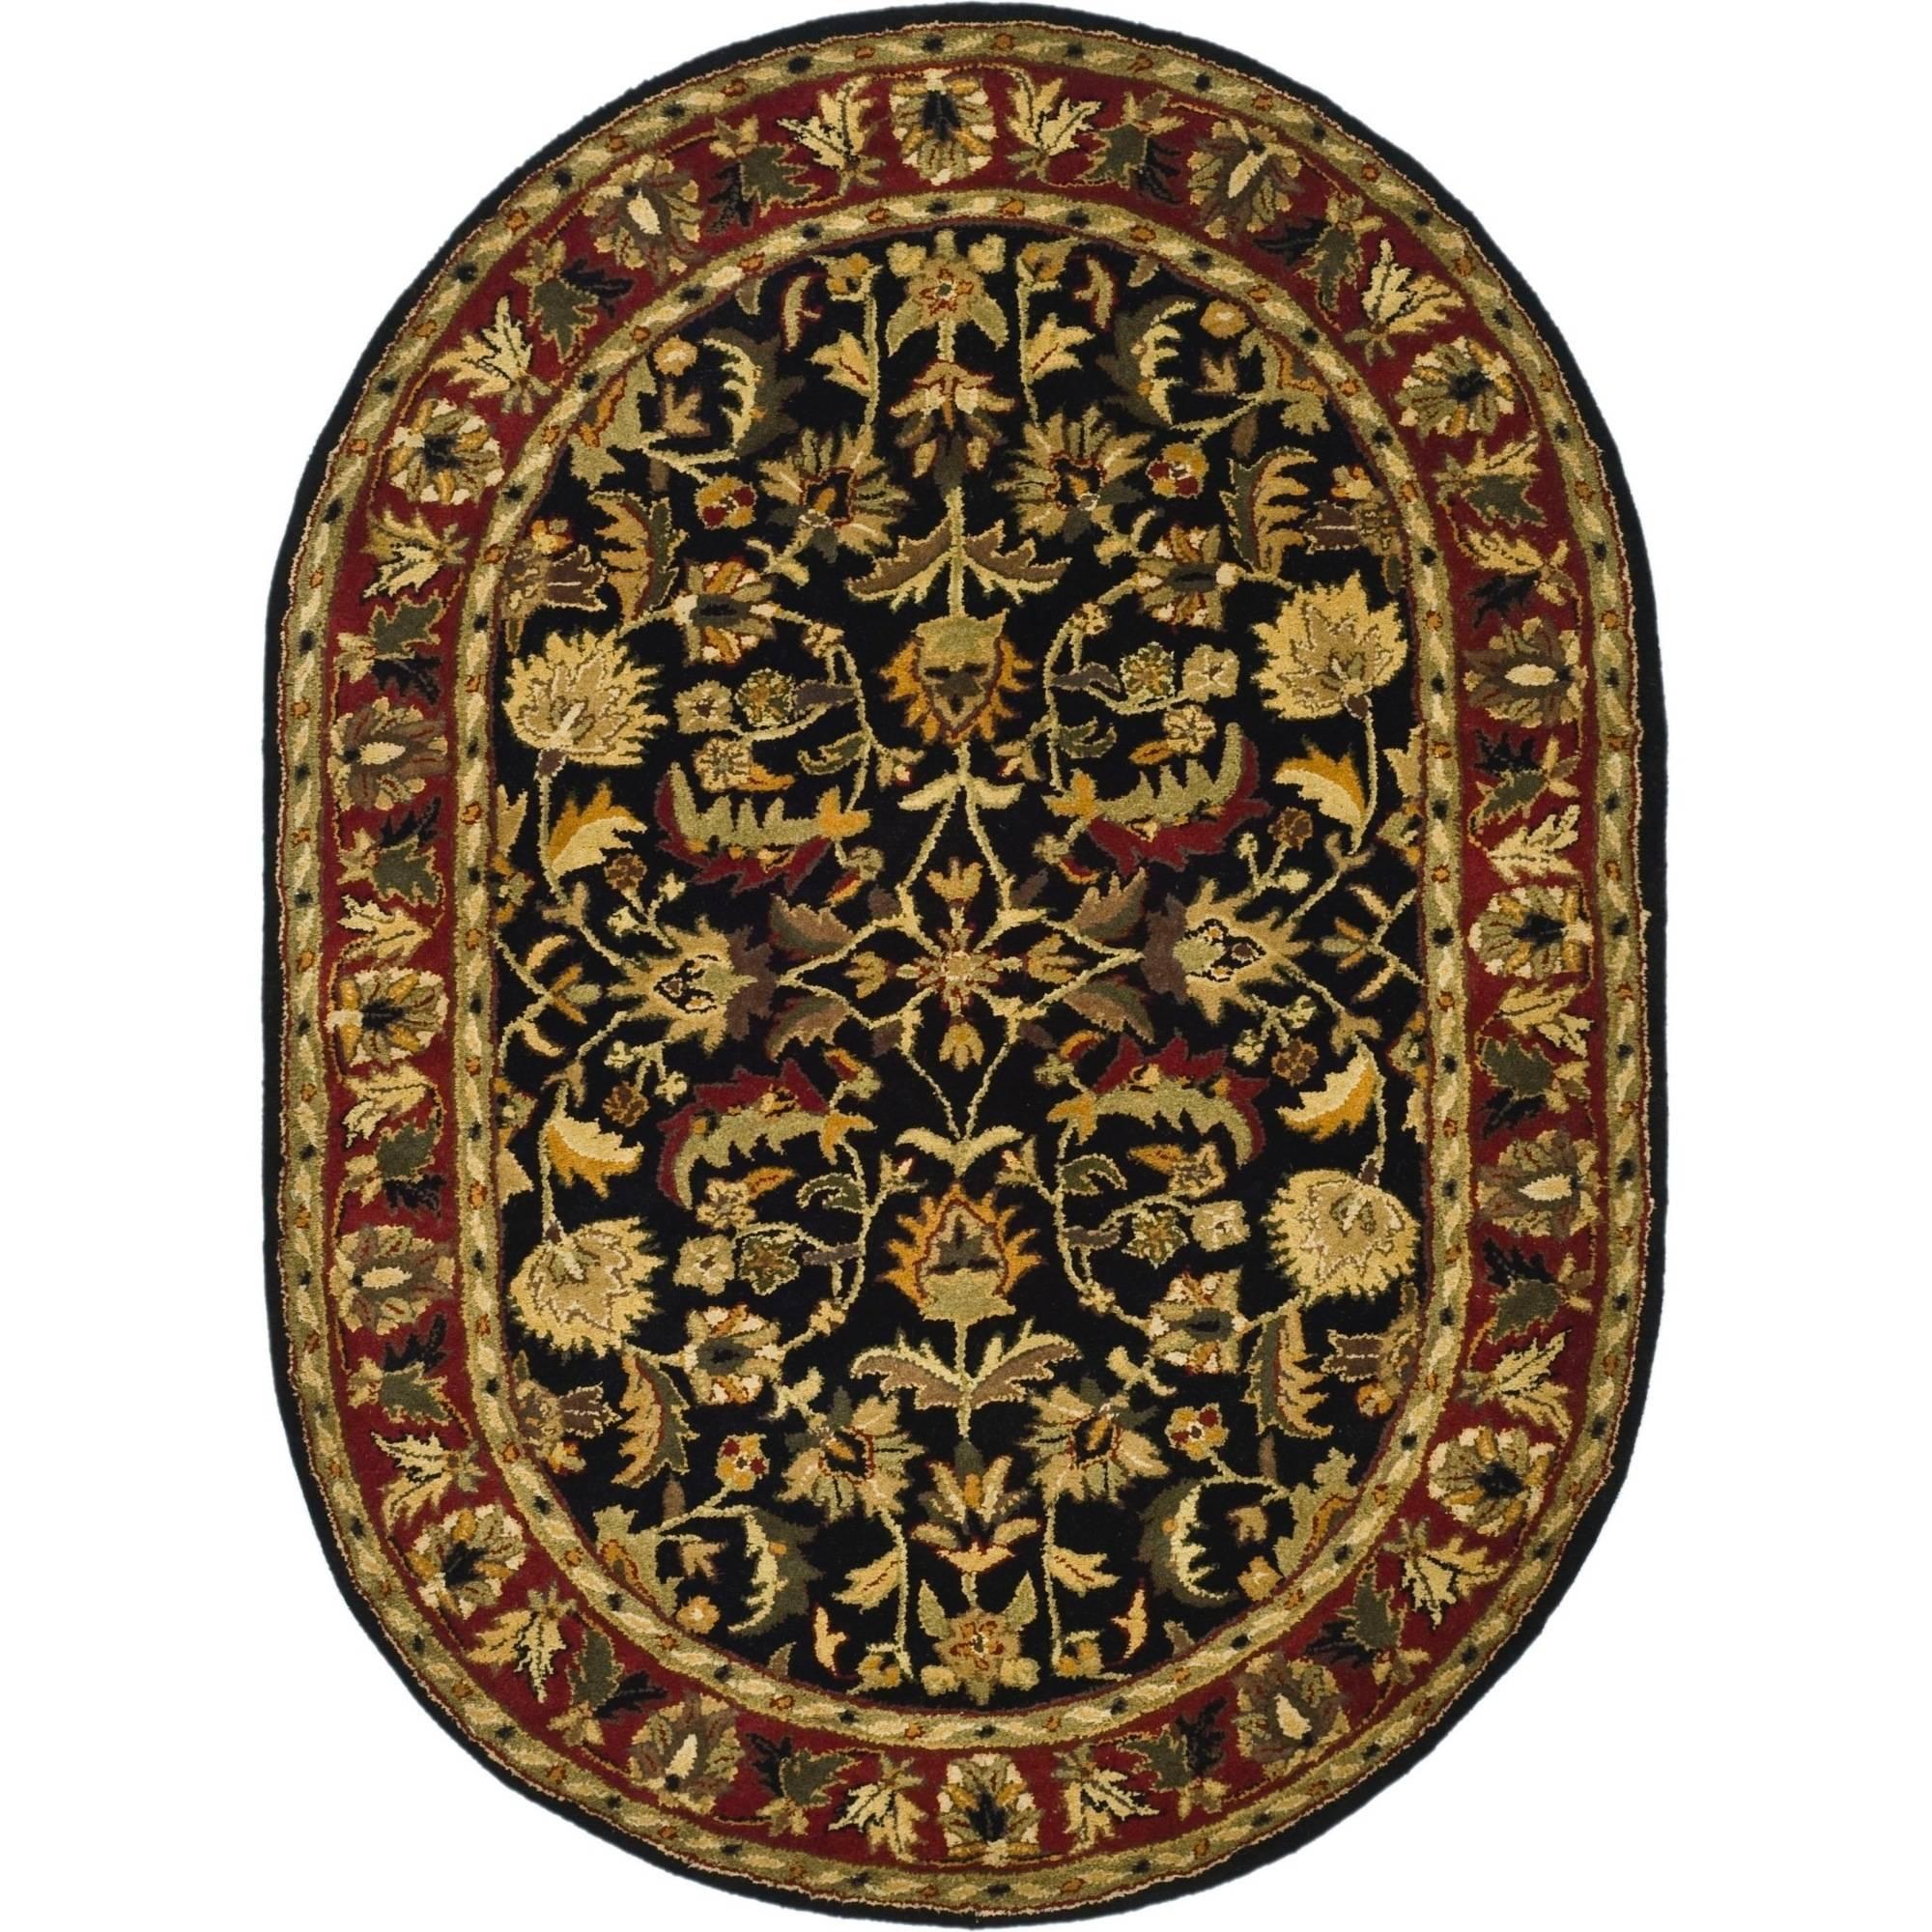 Safavieh Heritage Hepburn Hand-Tufted Wool Area Rug, Black/Red